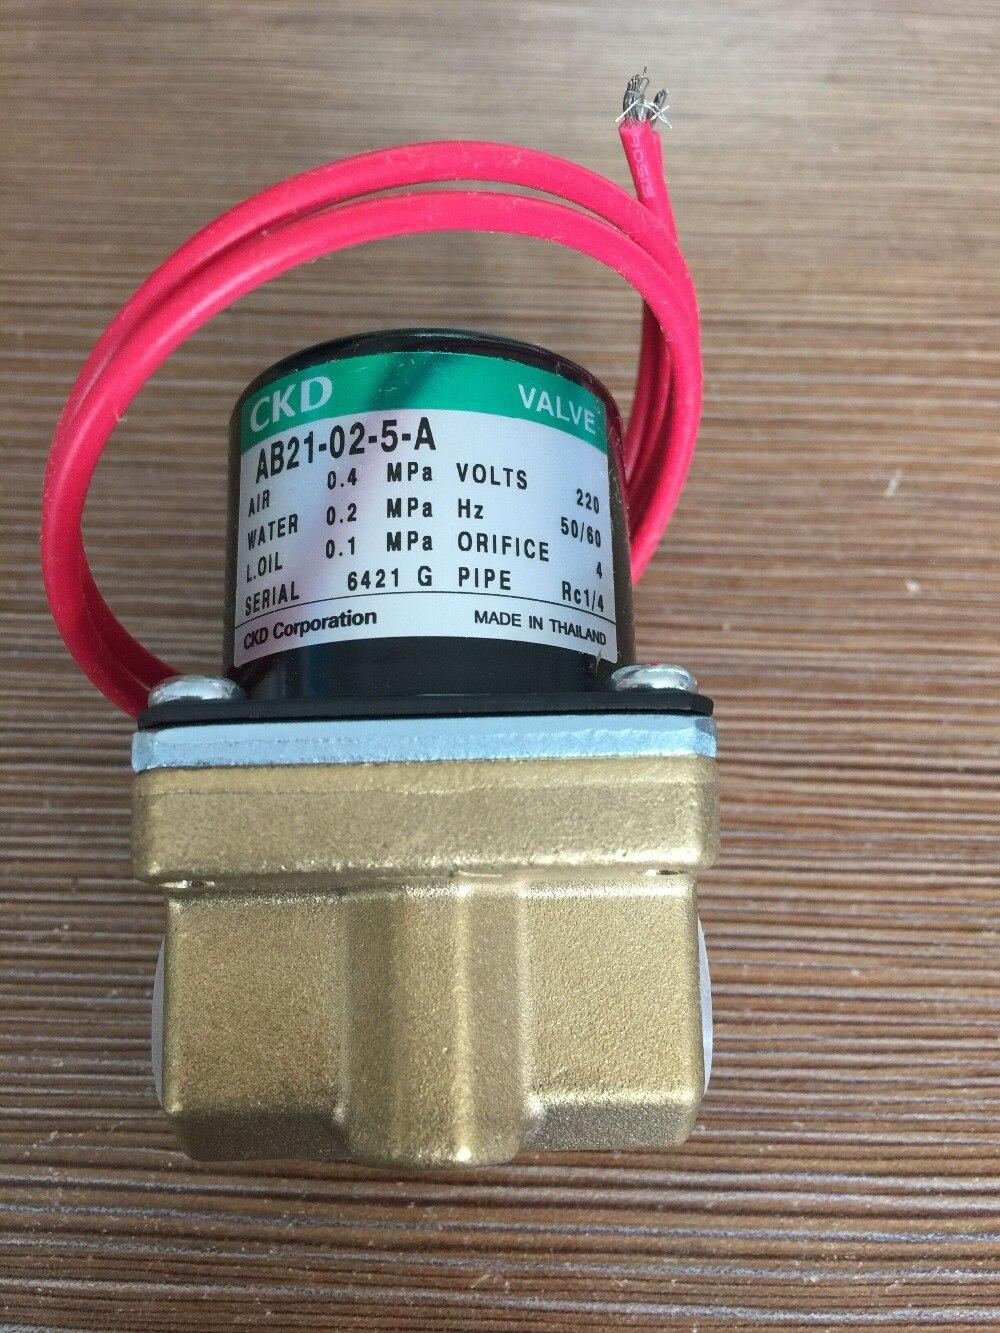 CKD solenoid valve AB21-02-5-A-AC220V Direct acting 2 port solenoid valve (general purpose valve) 1 2 2 2 way direct general service timer solenoid valve